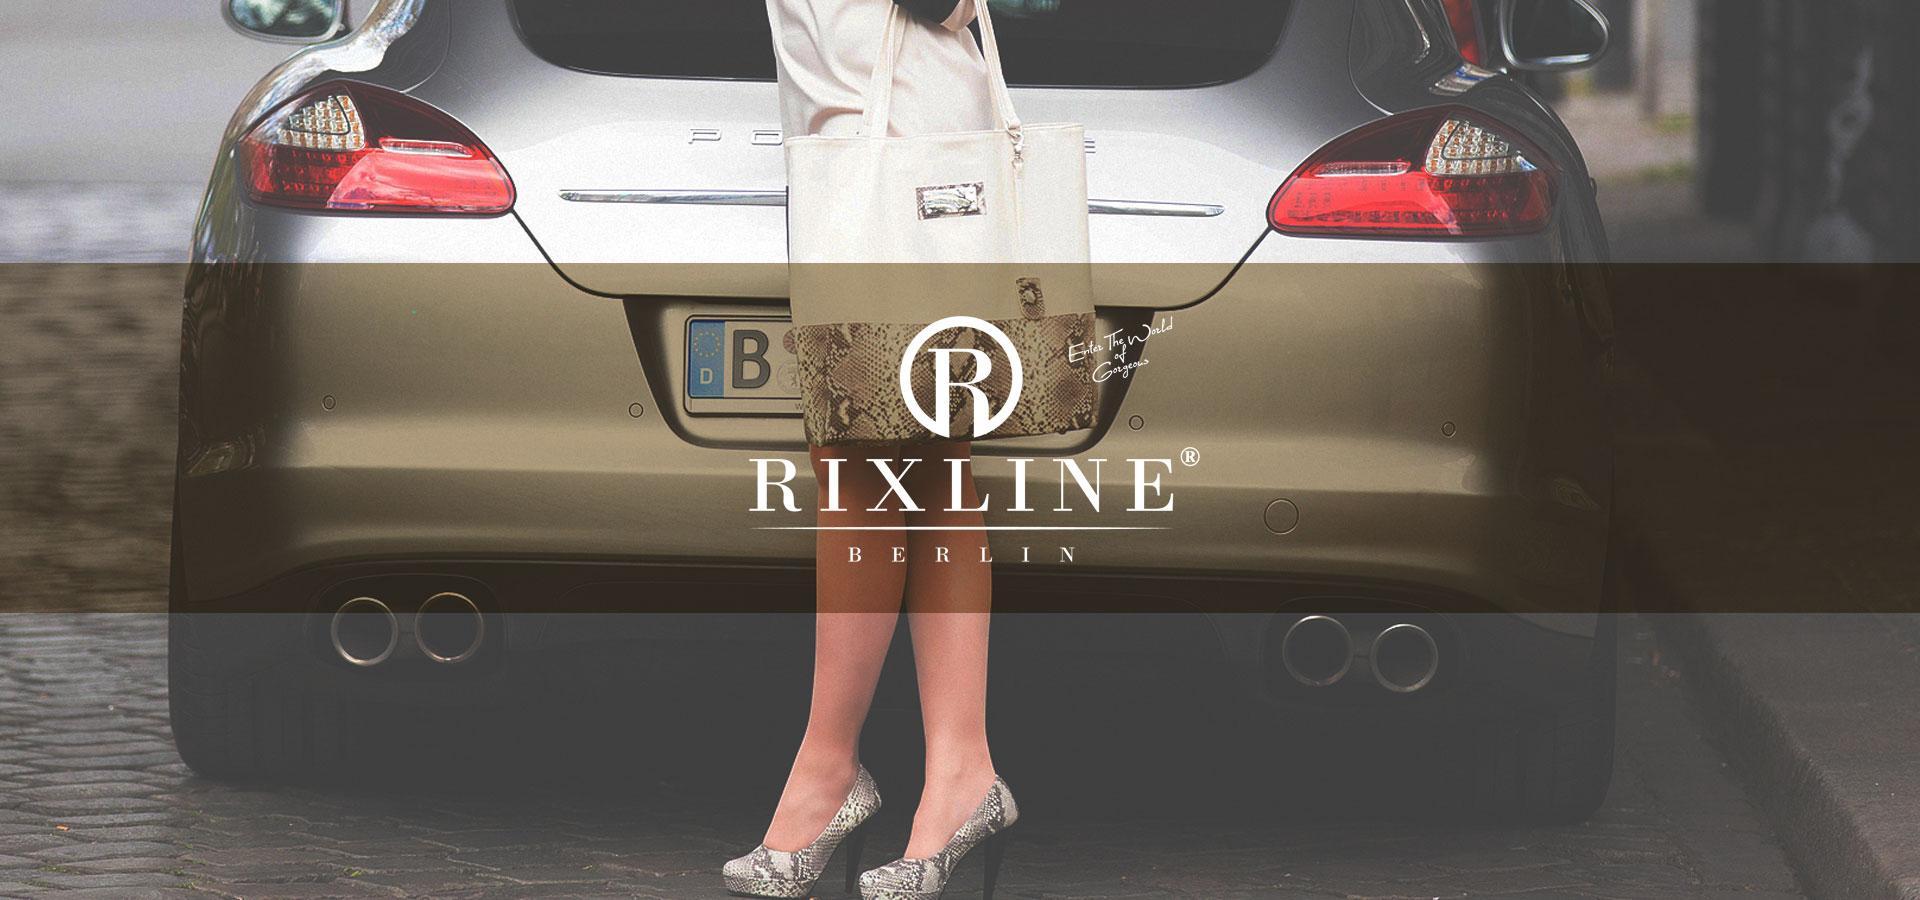 Rixline Berlin